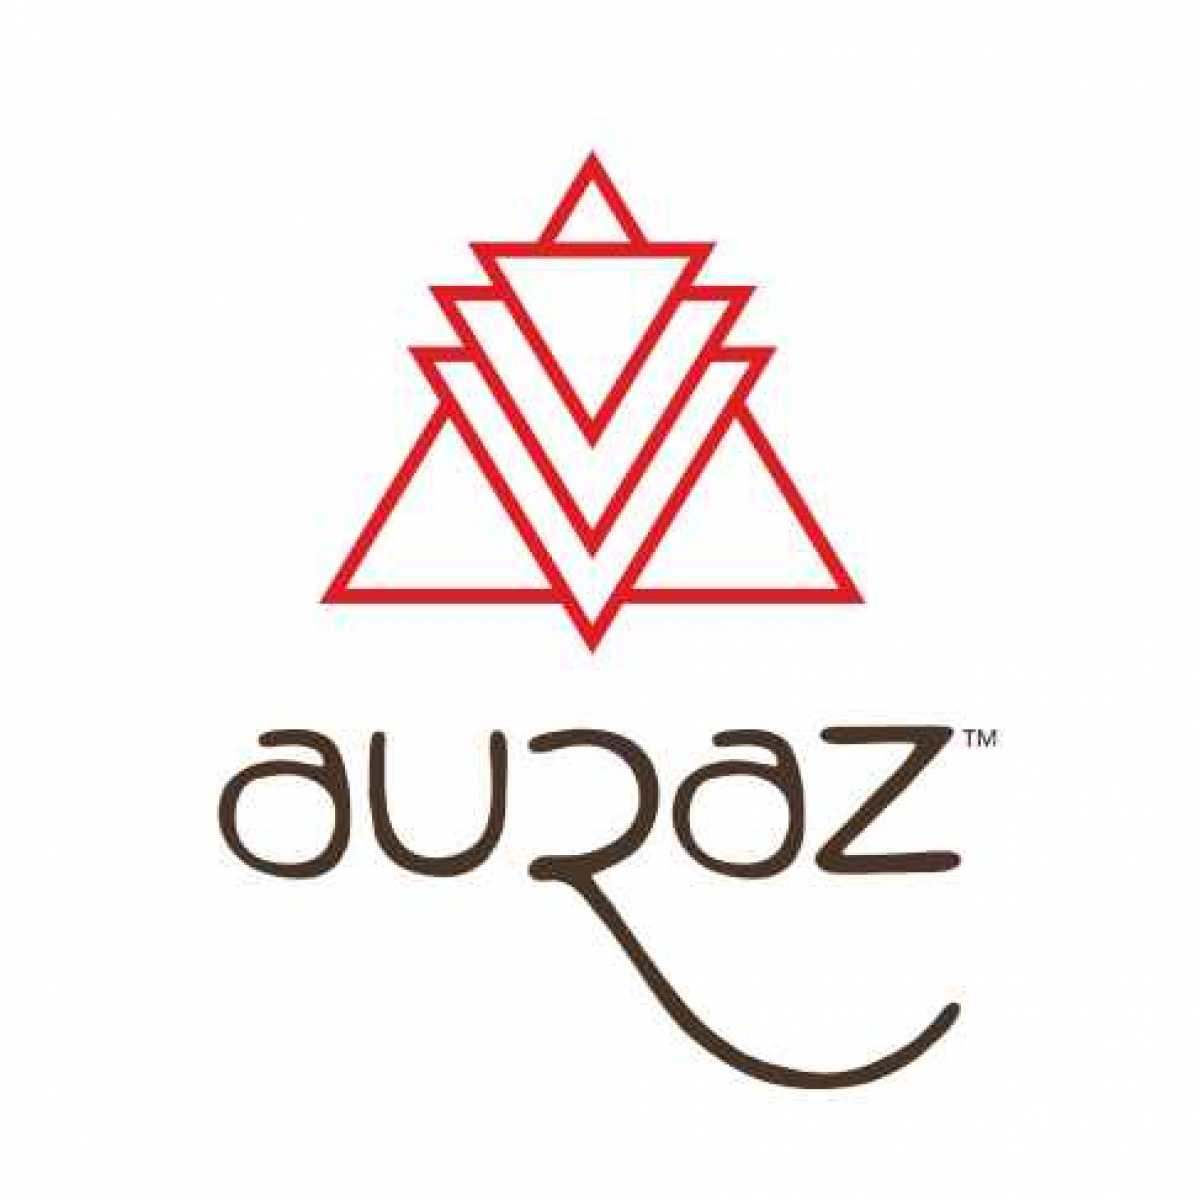 Auraz Design